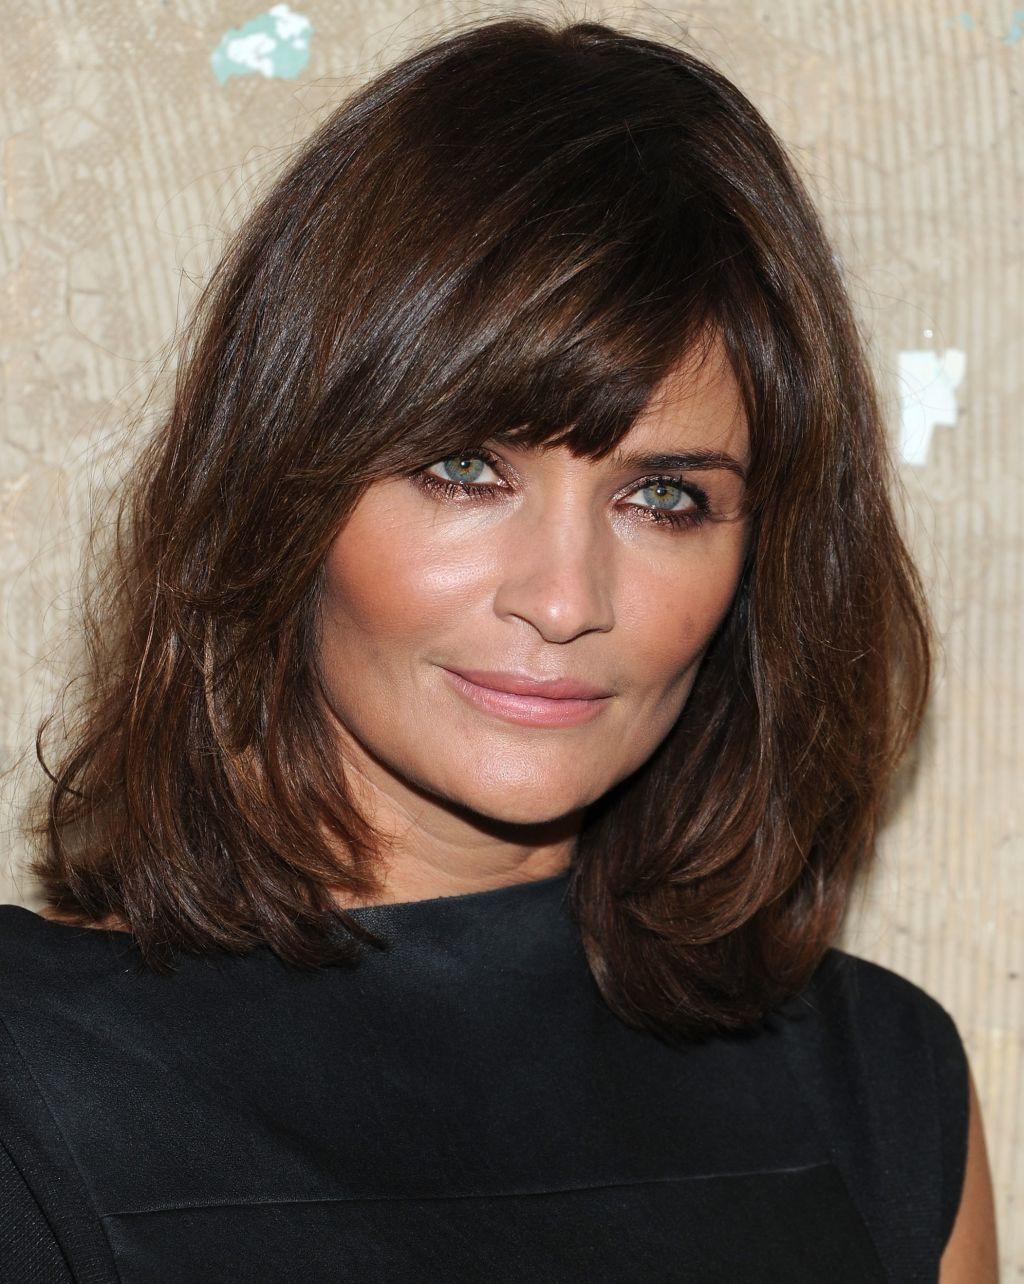 Pictures Of Medium Length Hairstyles  Medium shoulder length hairstyles Hairstyle for women & man